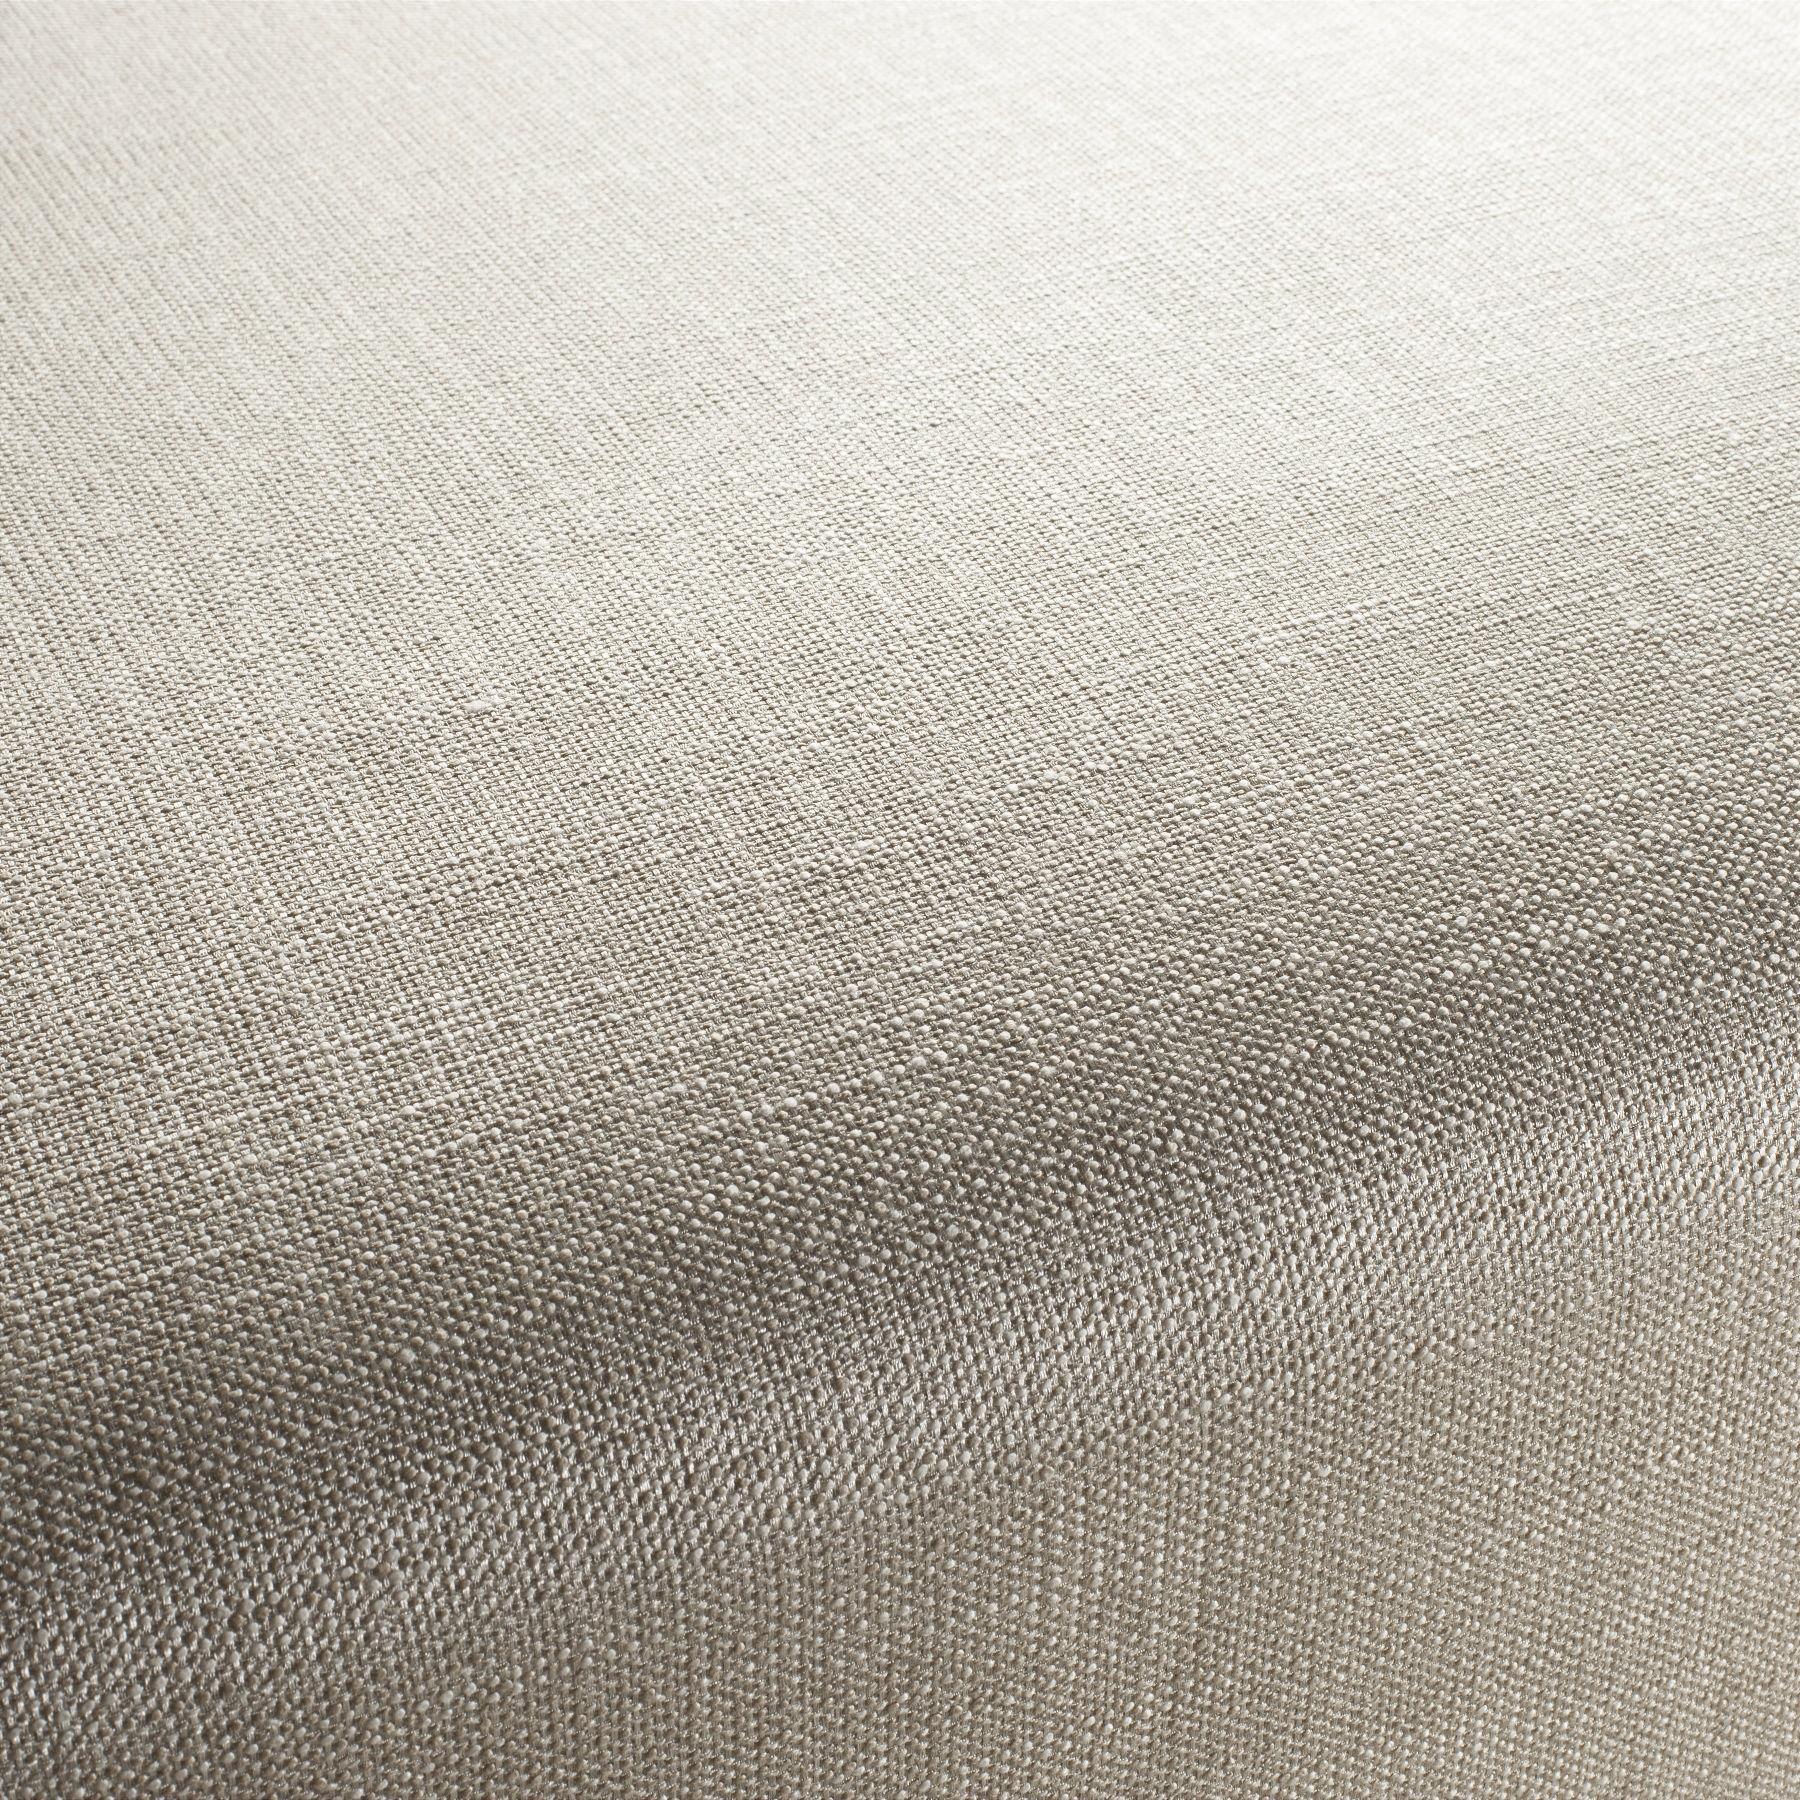 upholstery fabric staten island 9 2266 070 jab anstoetz. Black Bedroom Furniture Sets. Home Design Ideas